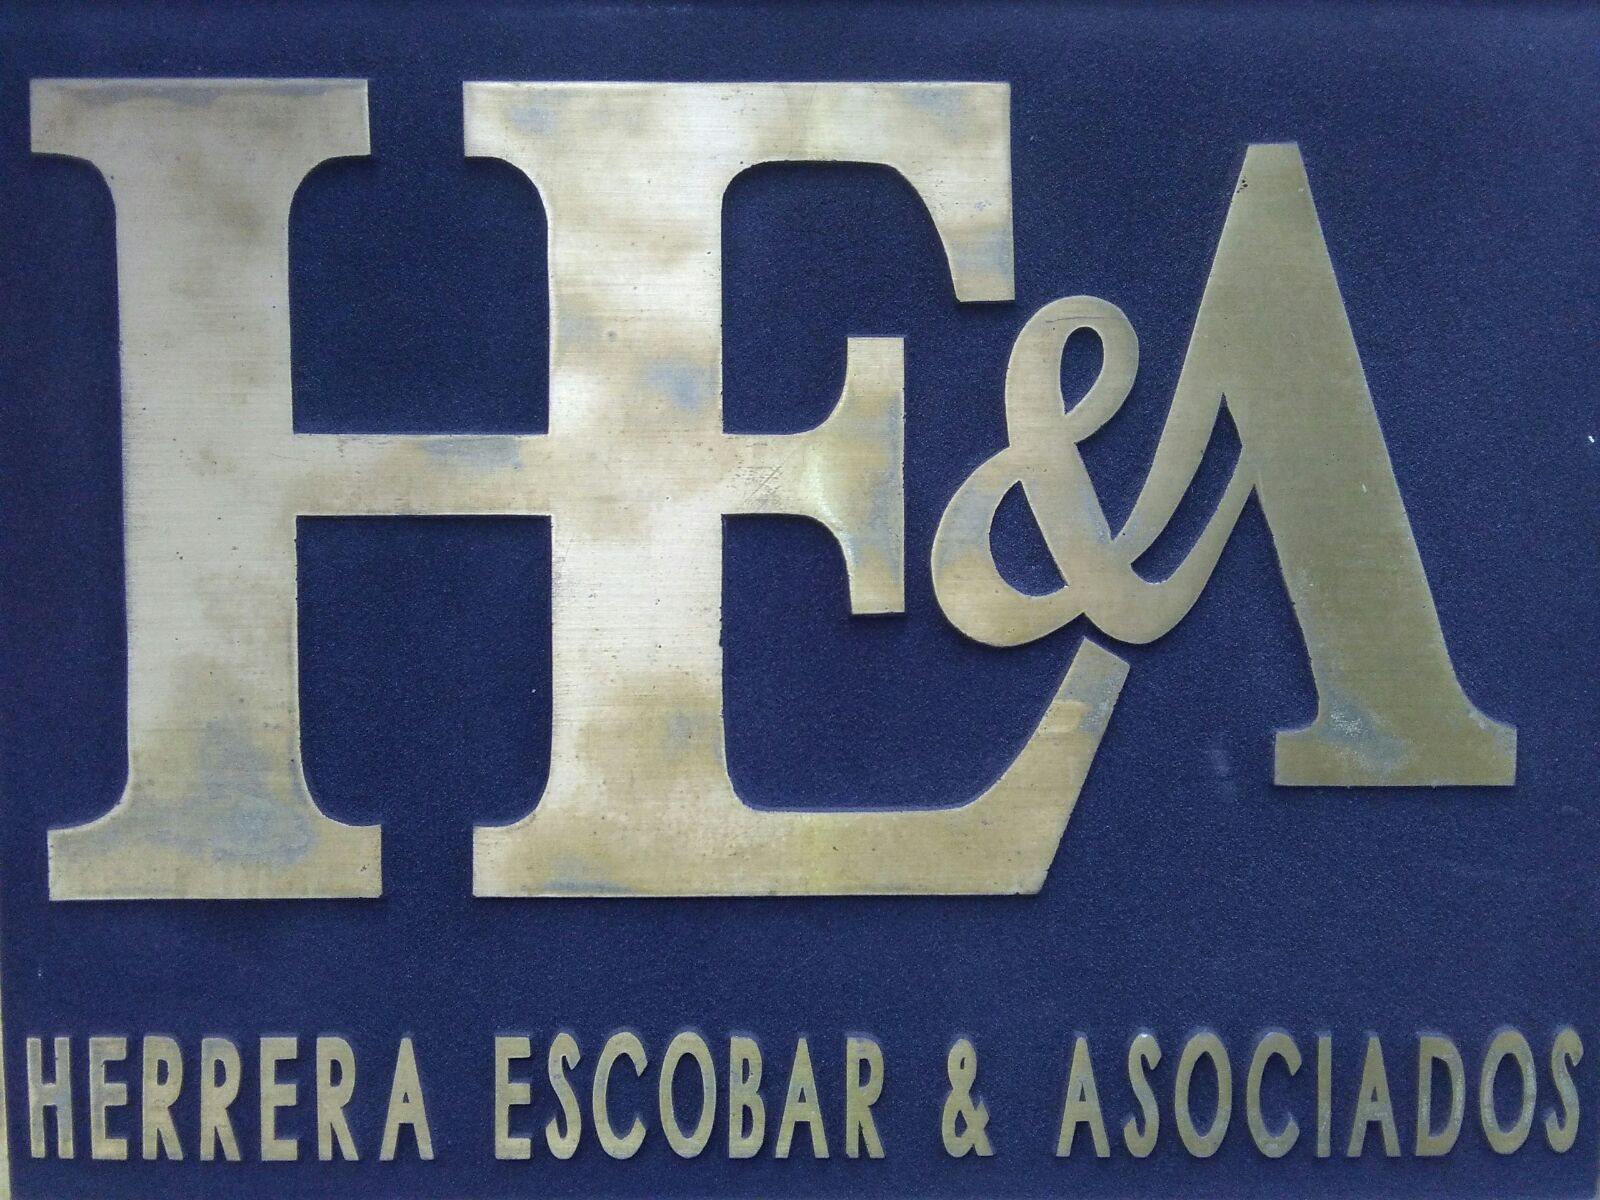 Herrera Escobar & Asociados, S.C.